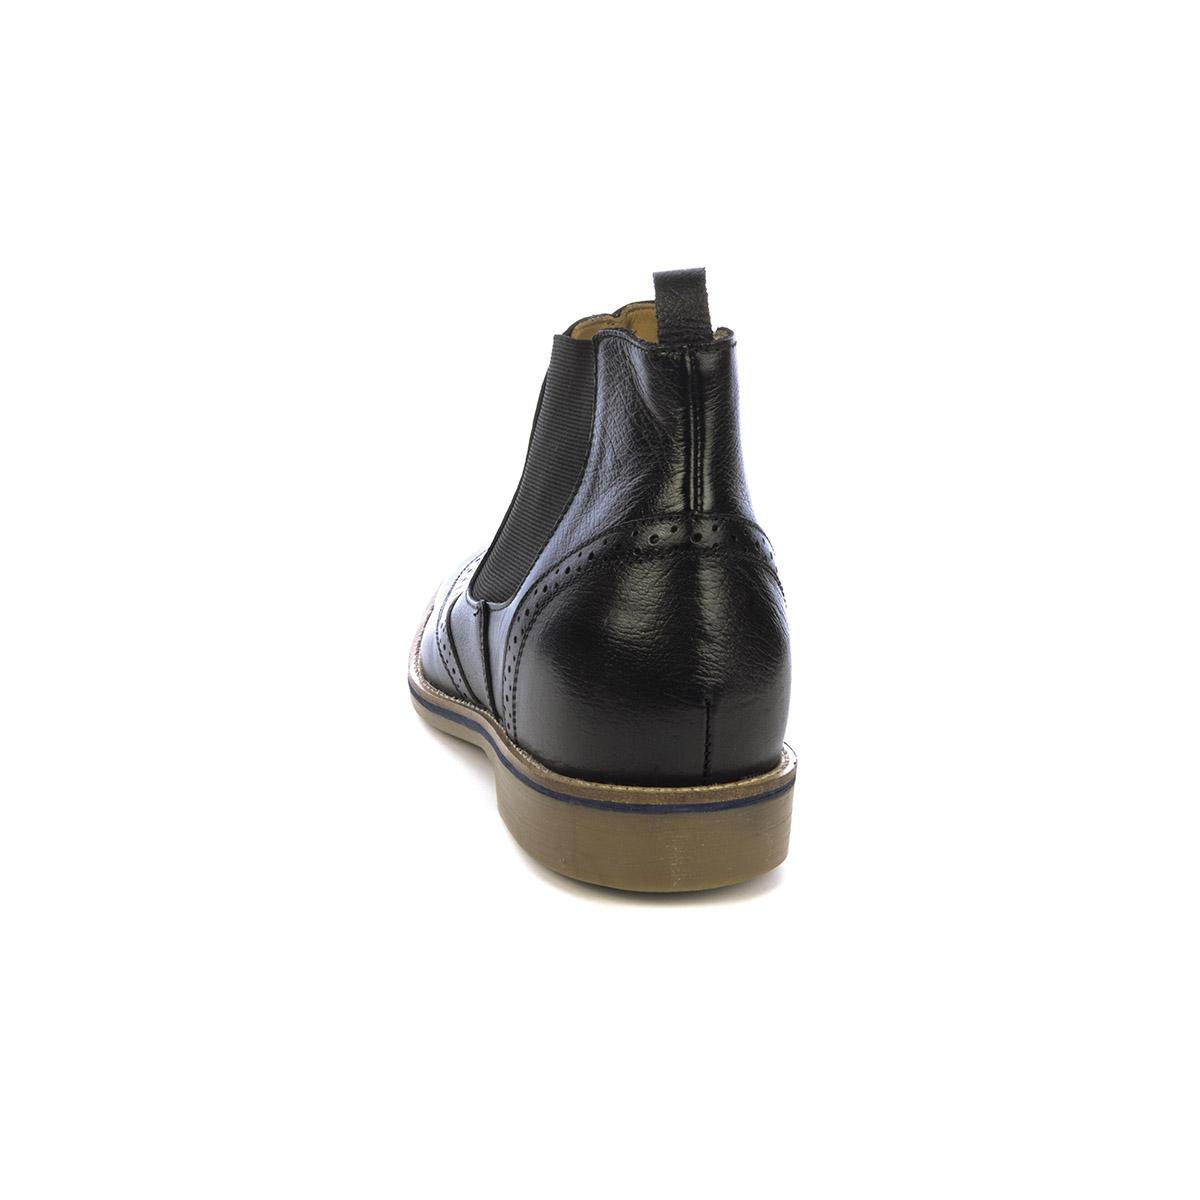 Botín Casual Empire Negro Max Denegri + 7 cms de Altura_76439